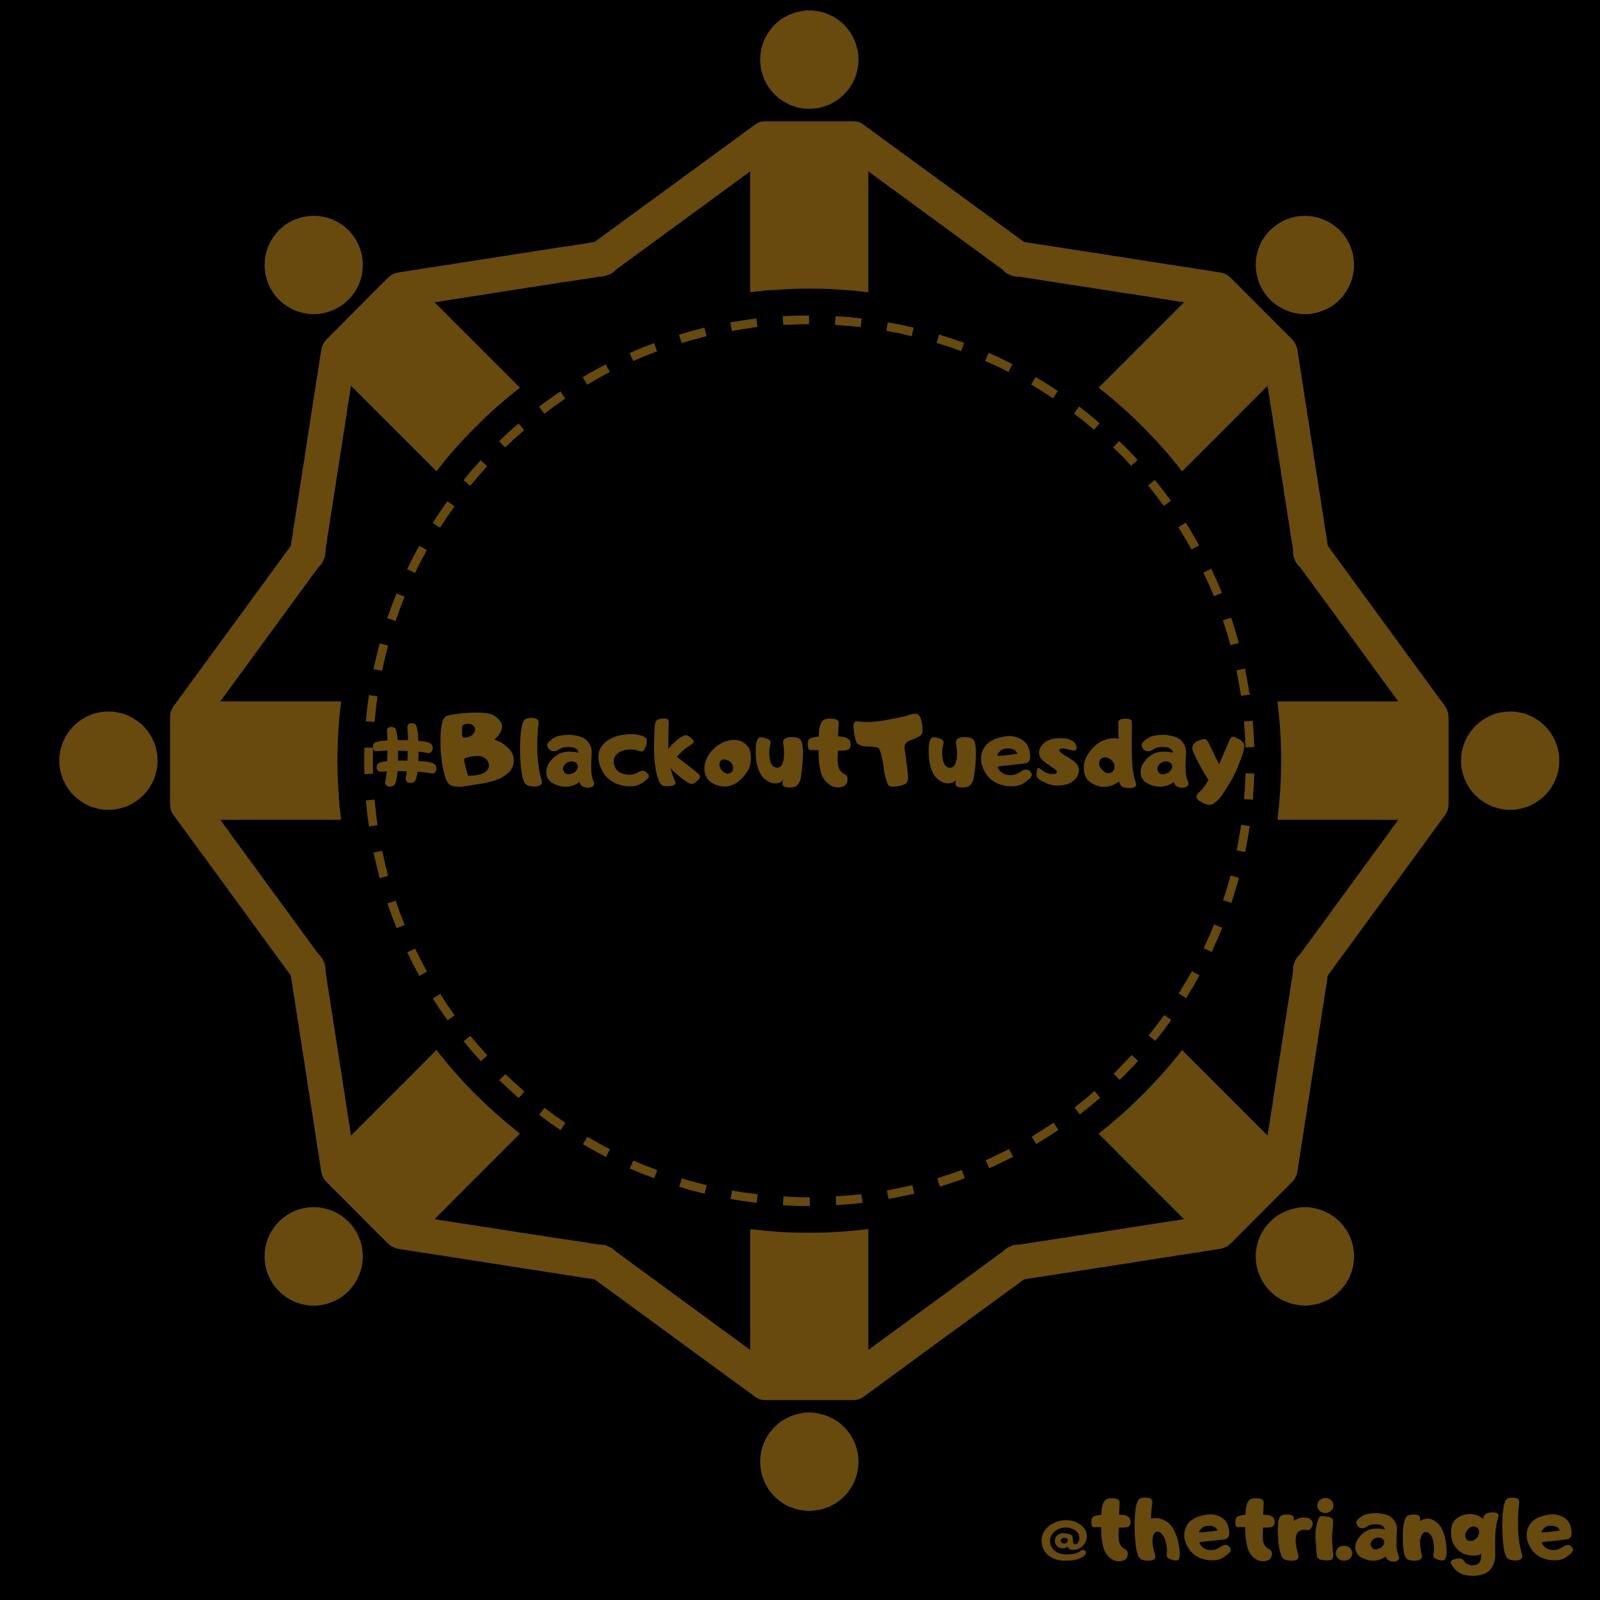 Blackout Tuesday!